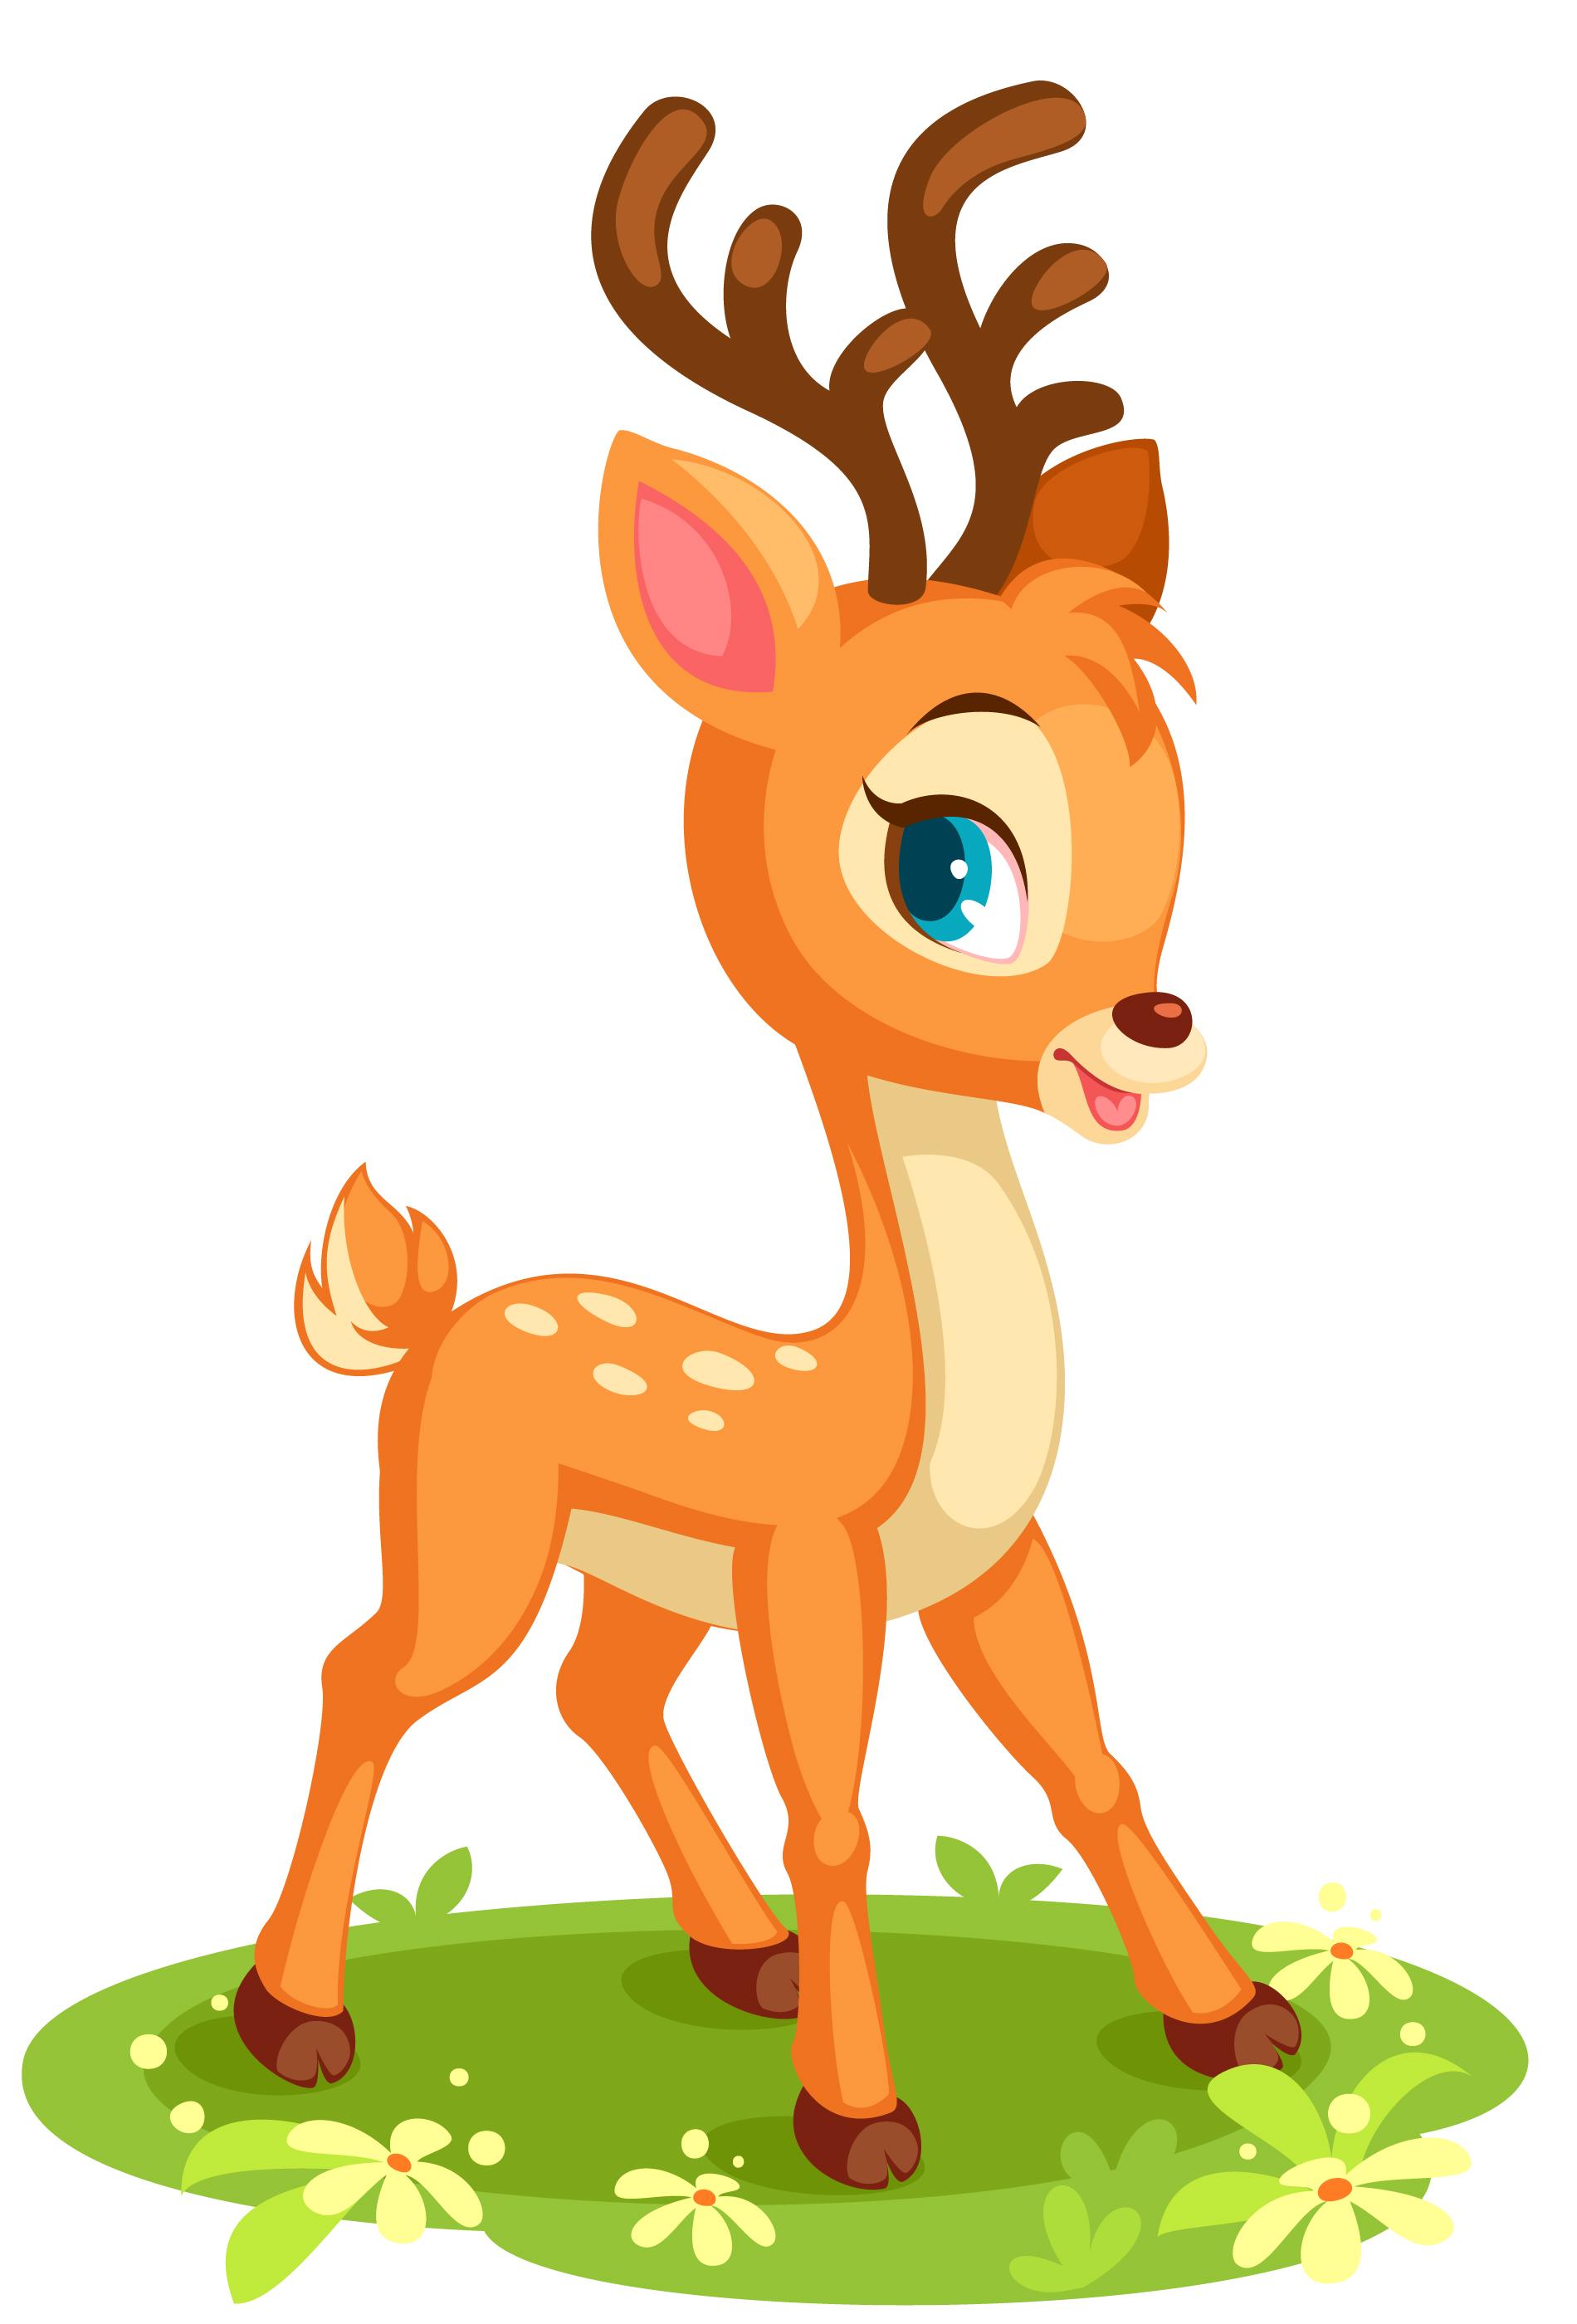 Cute baby deer in pose - Download Free Vectors, Clipart ...